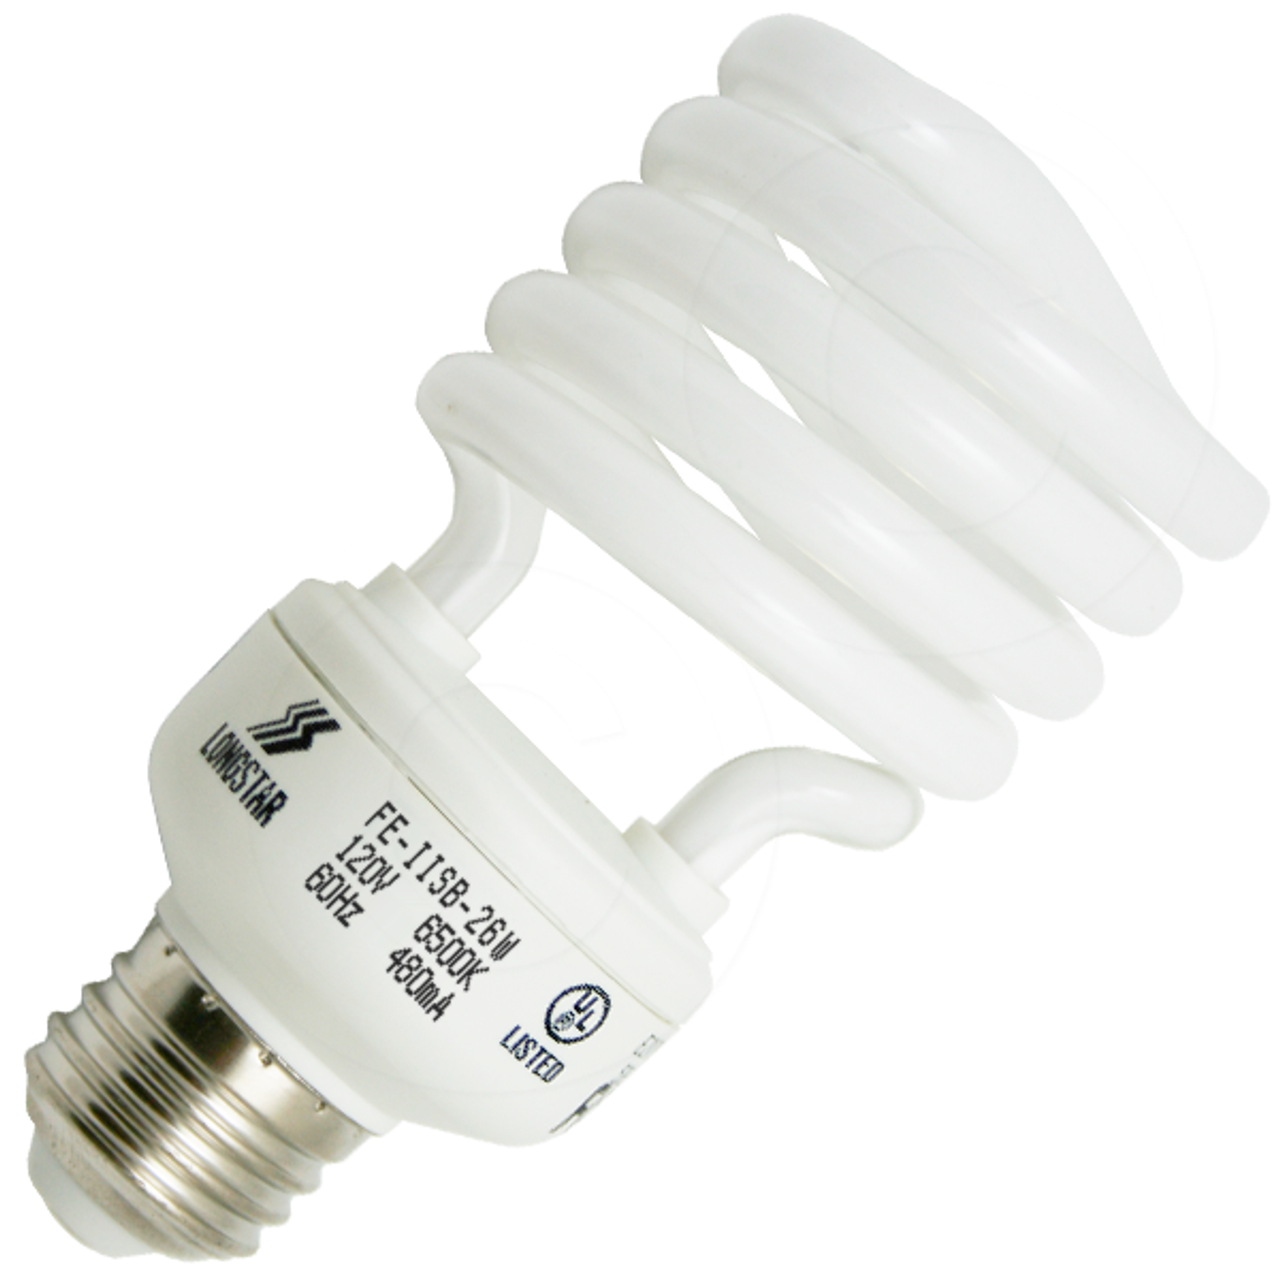 26W CFL Mini Spiral GU24 Base 5000K Daylight =120W Fluorescent Light Bulb 2 Prong Twist and Lock Spiral